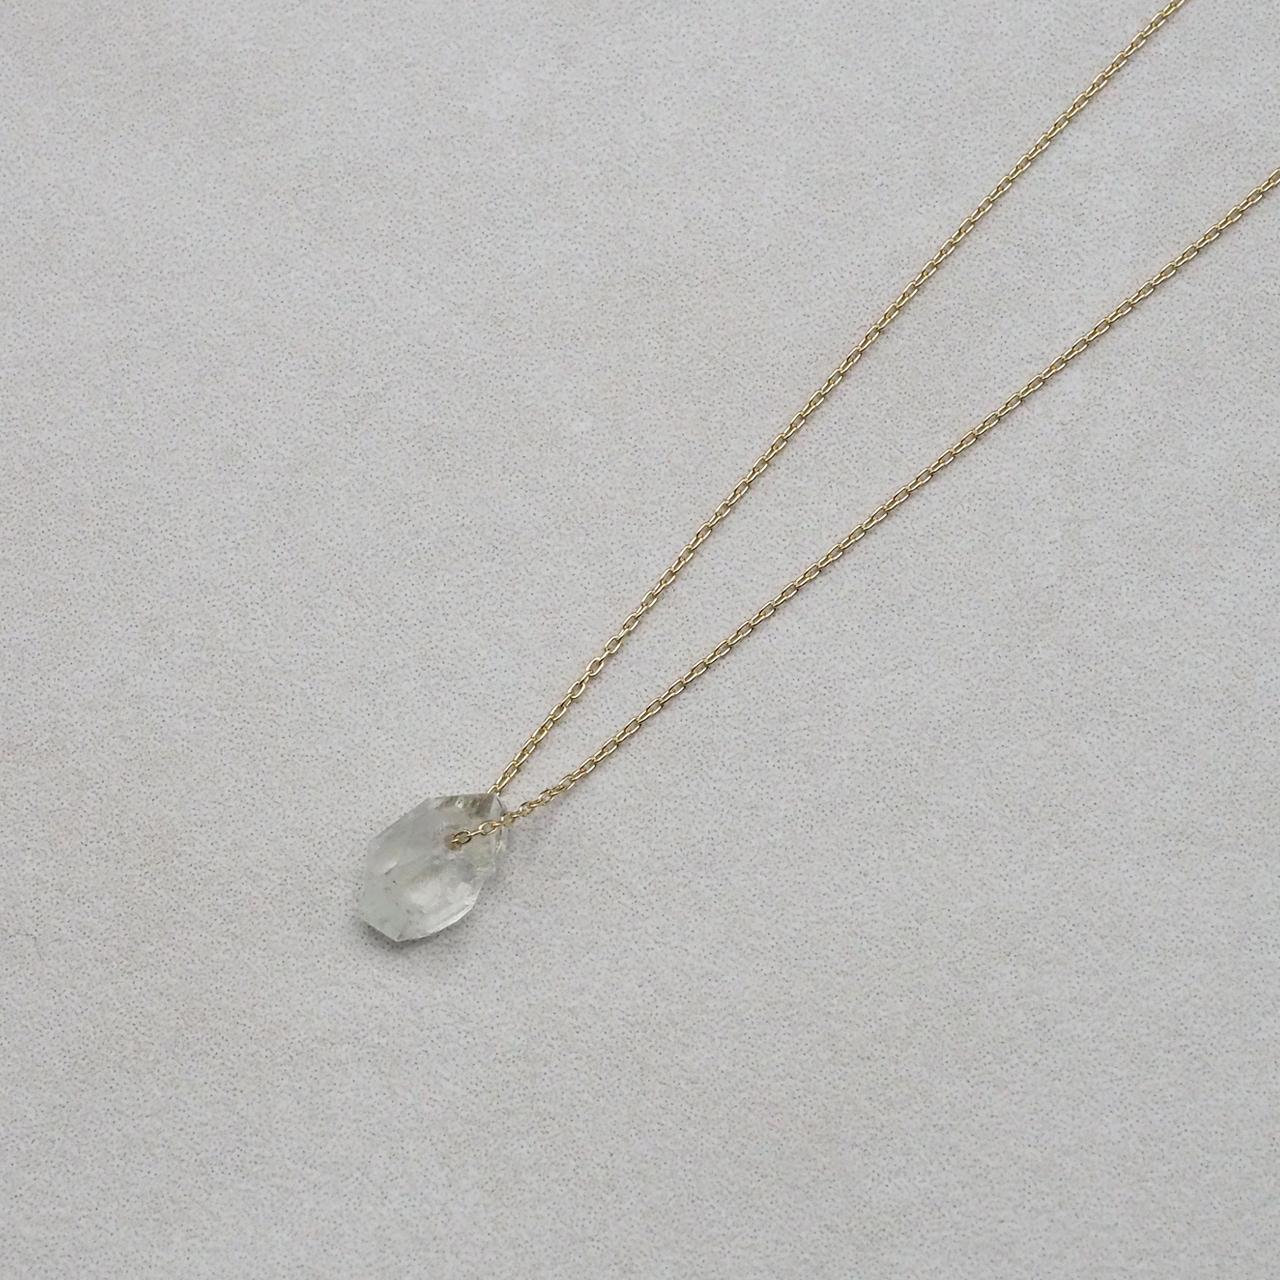 Himalayan Crystal Necklace Pendant_No.21200120